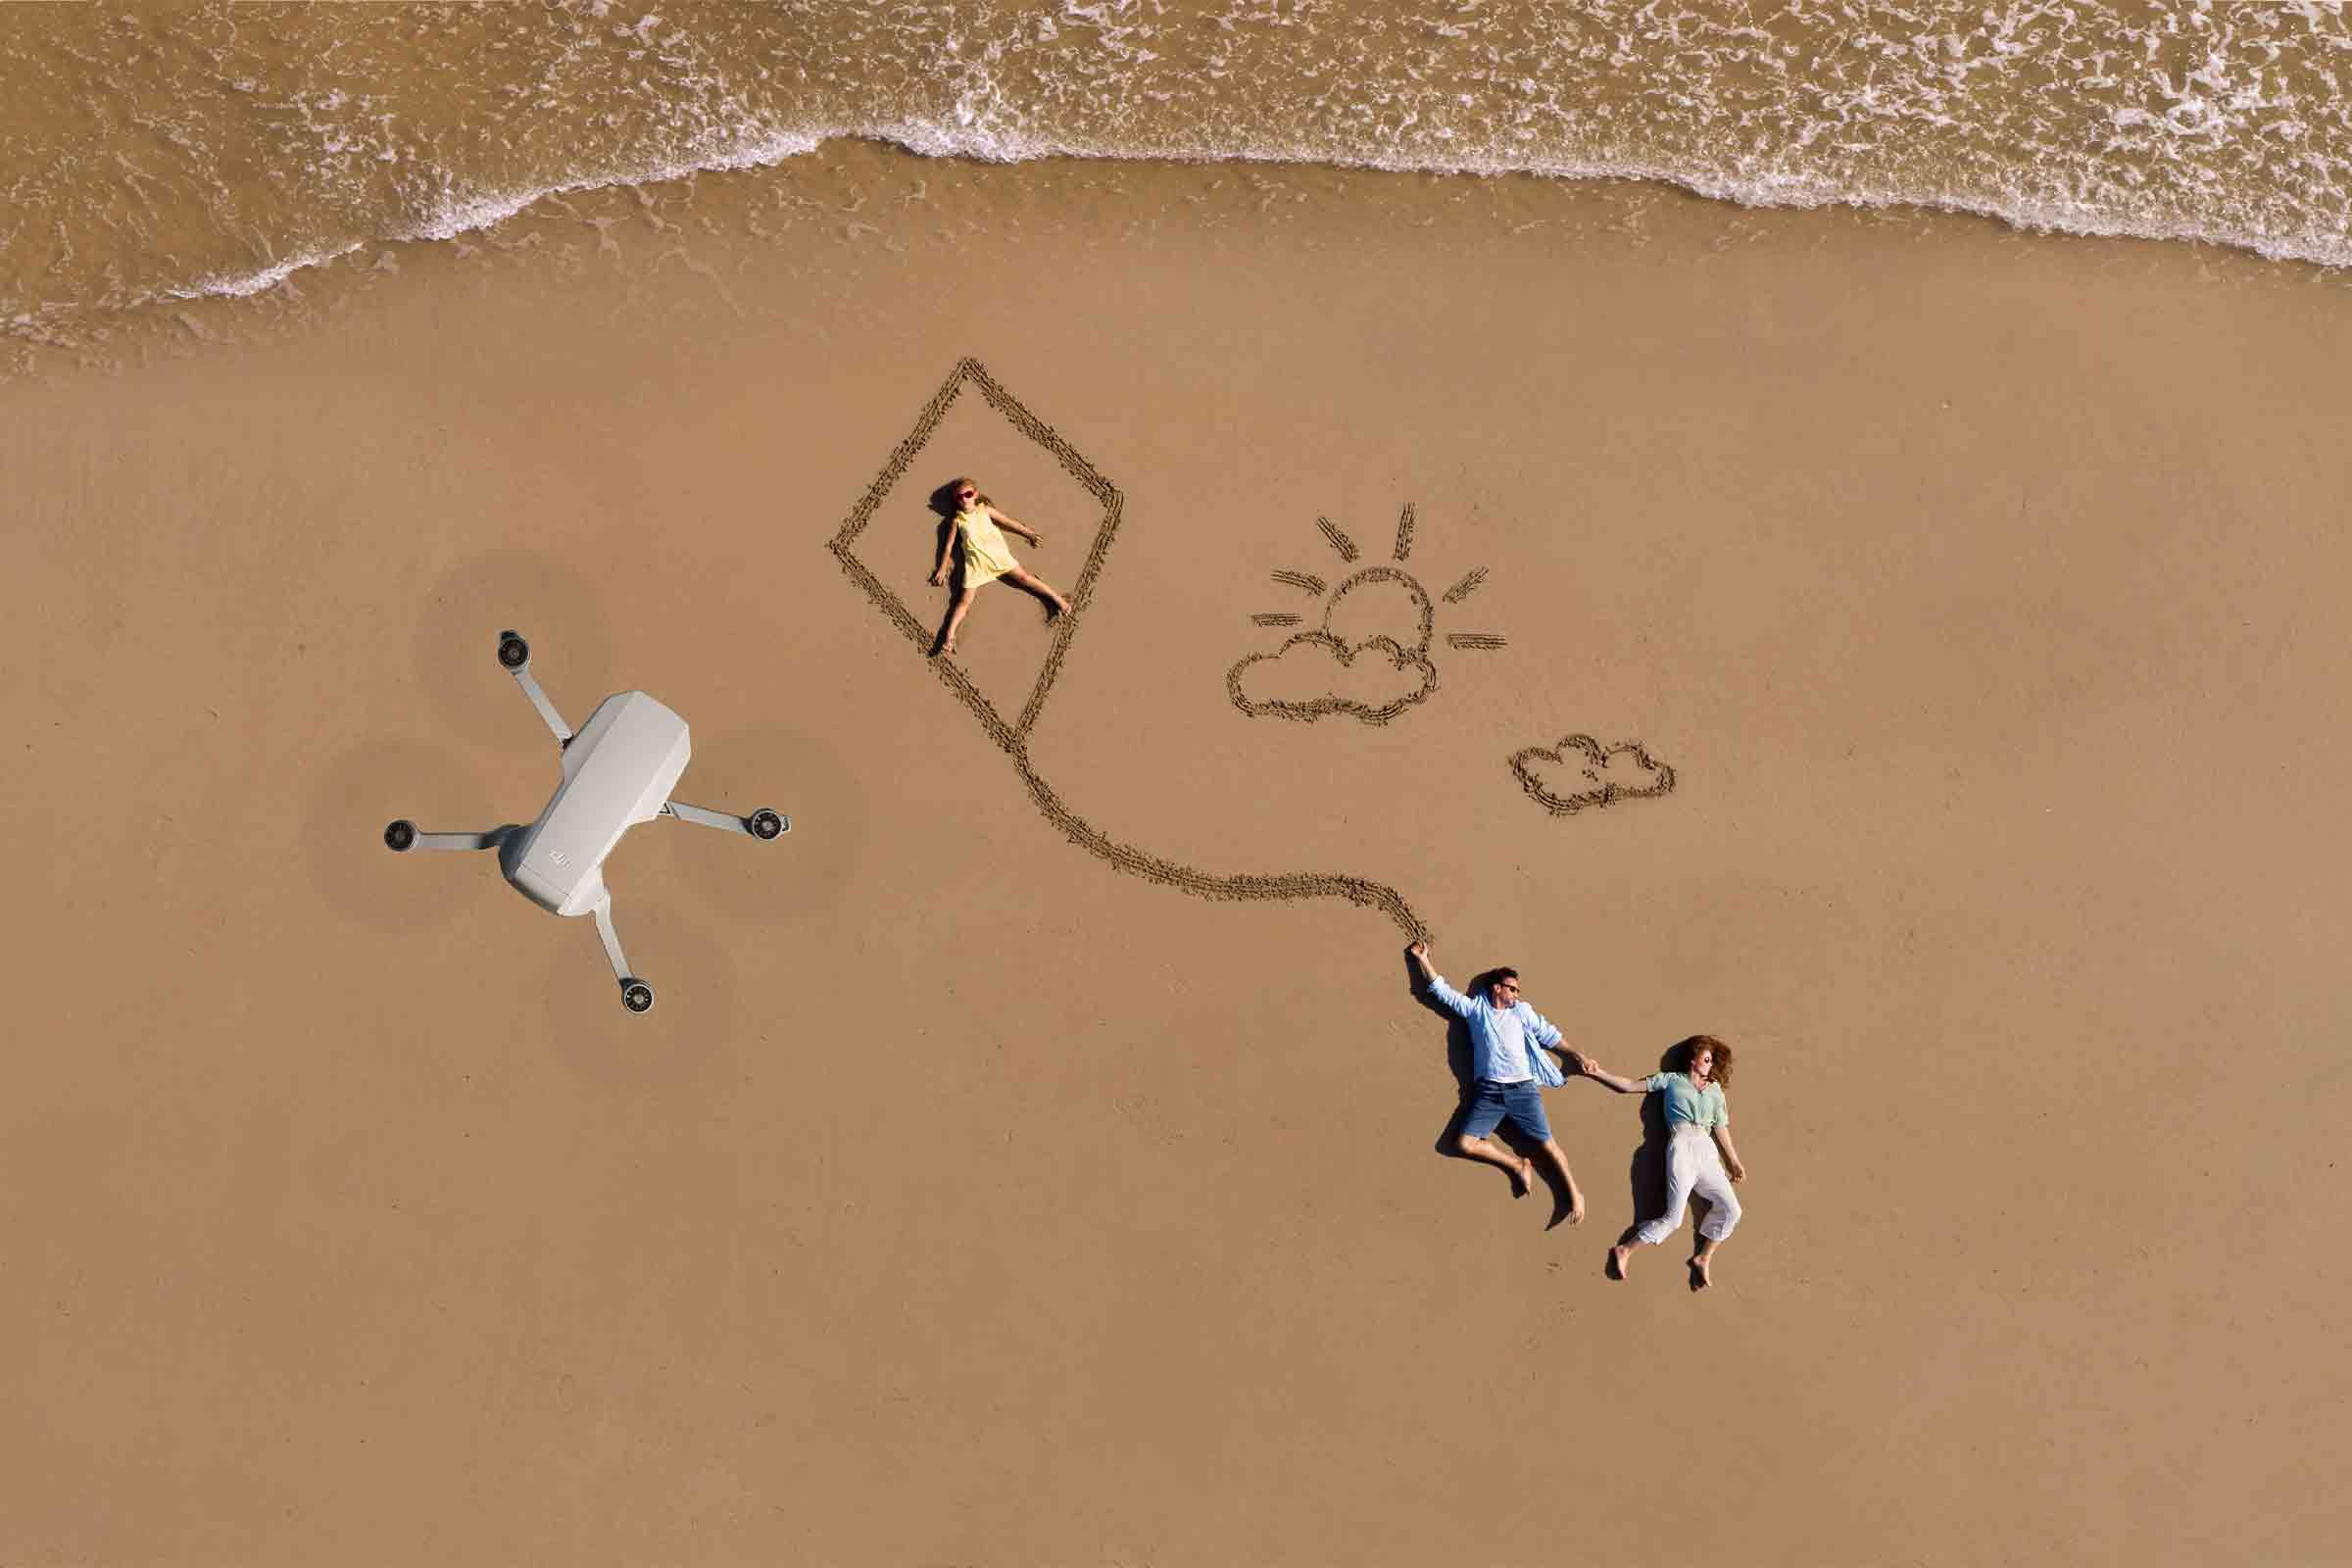 DJI Mini 2 seaside aerial photography